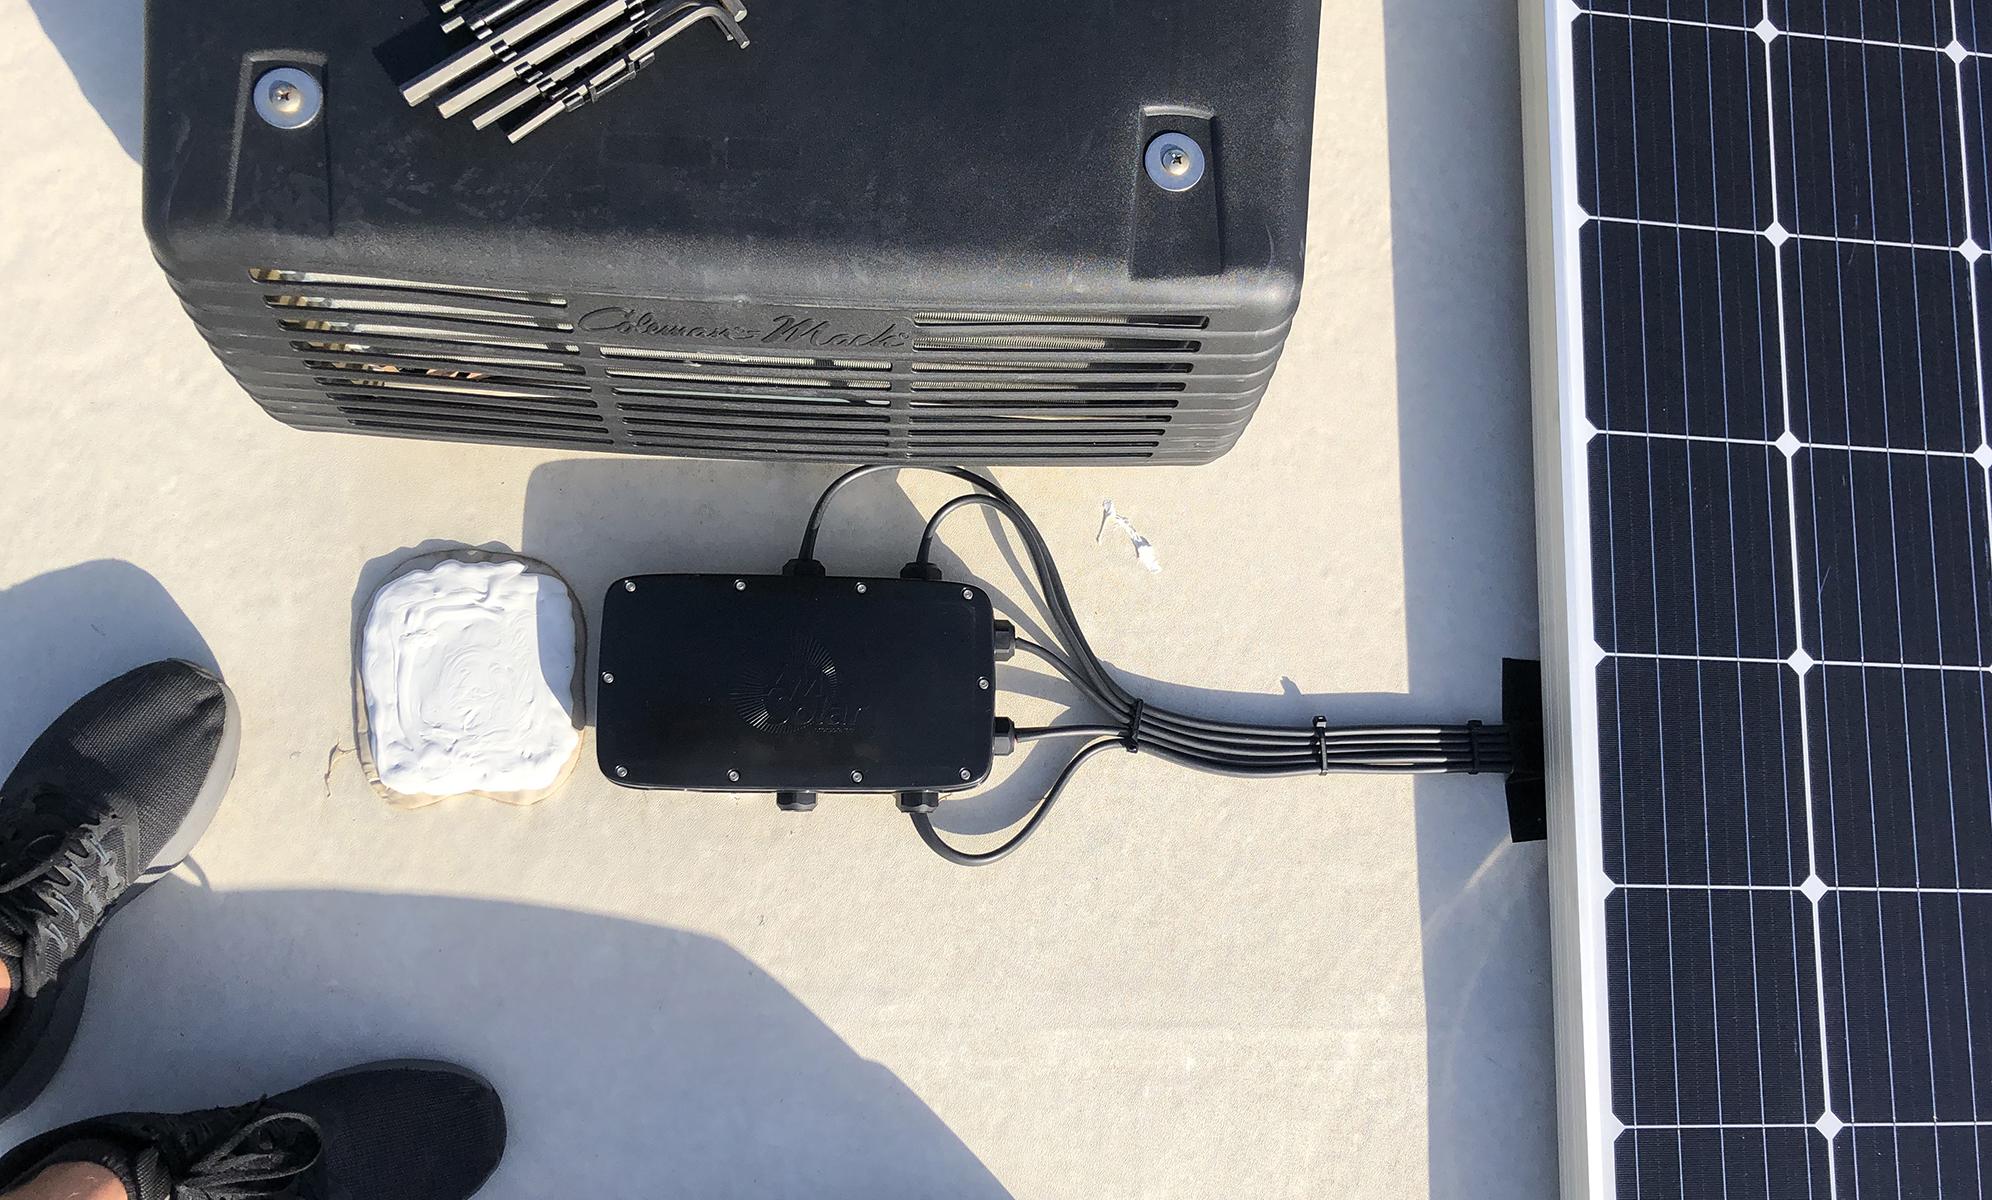 AMSolar Combiner Box Solar Panel 5th Wheel RV